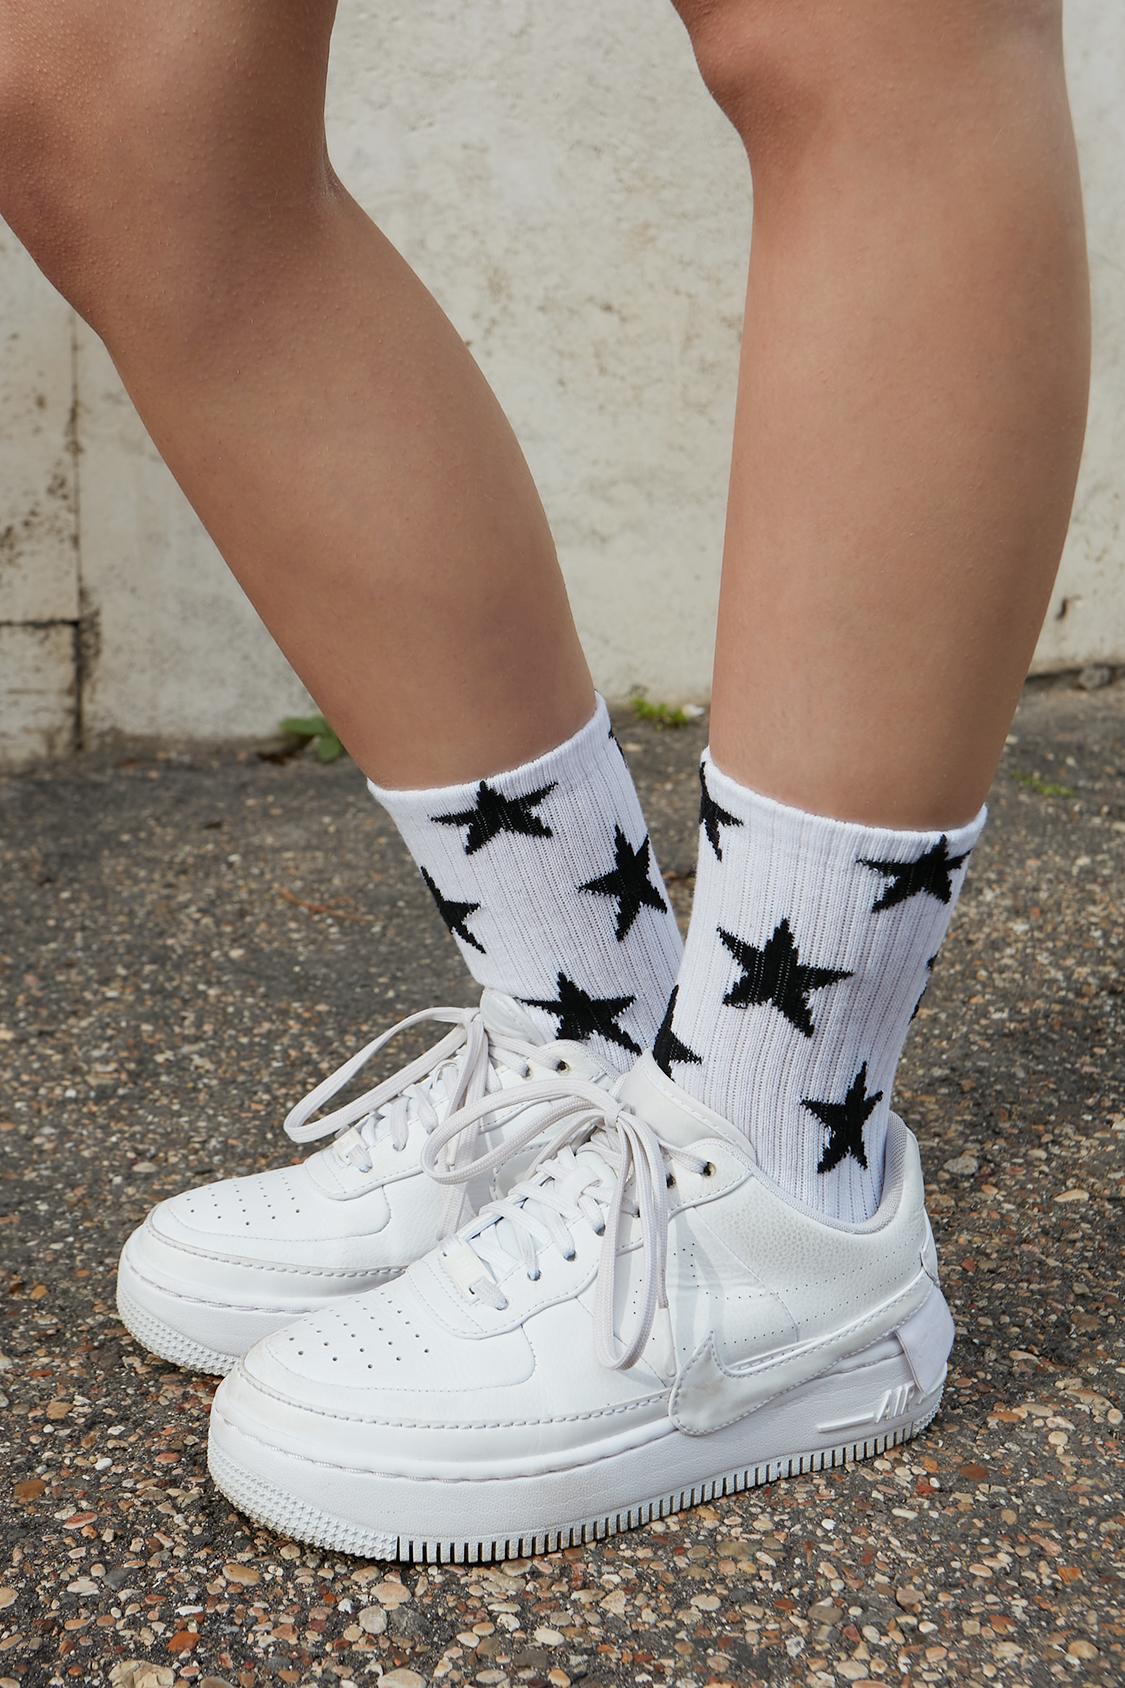 Calzini stelle